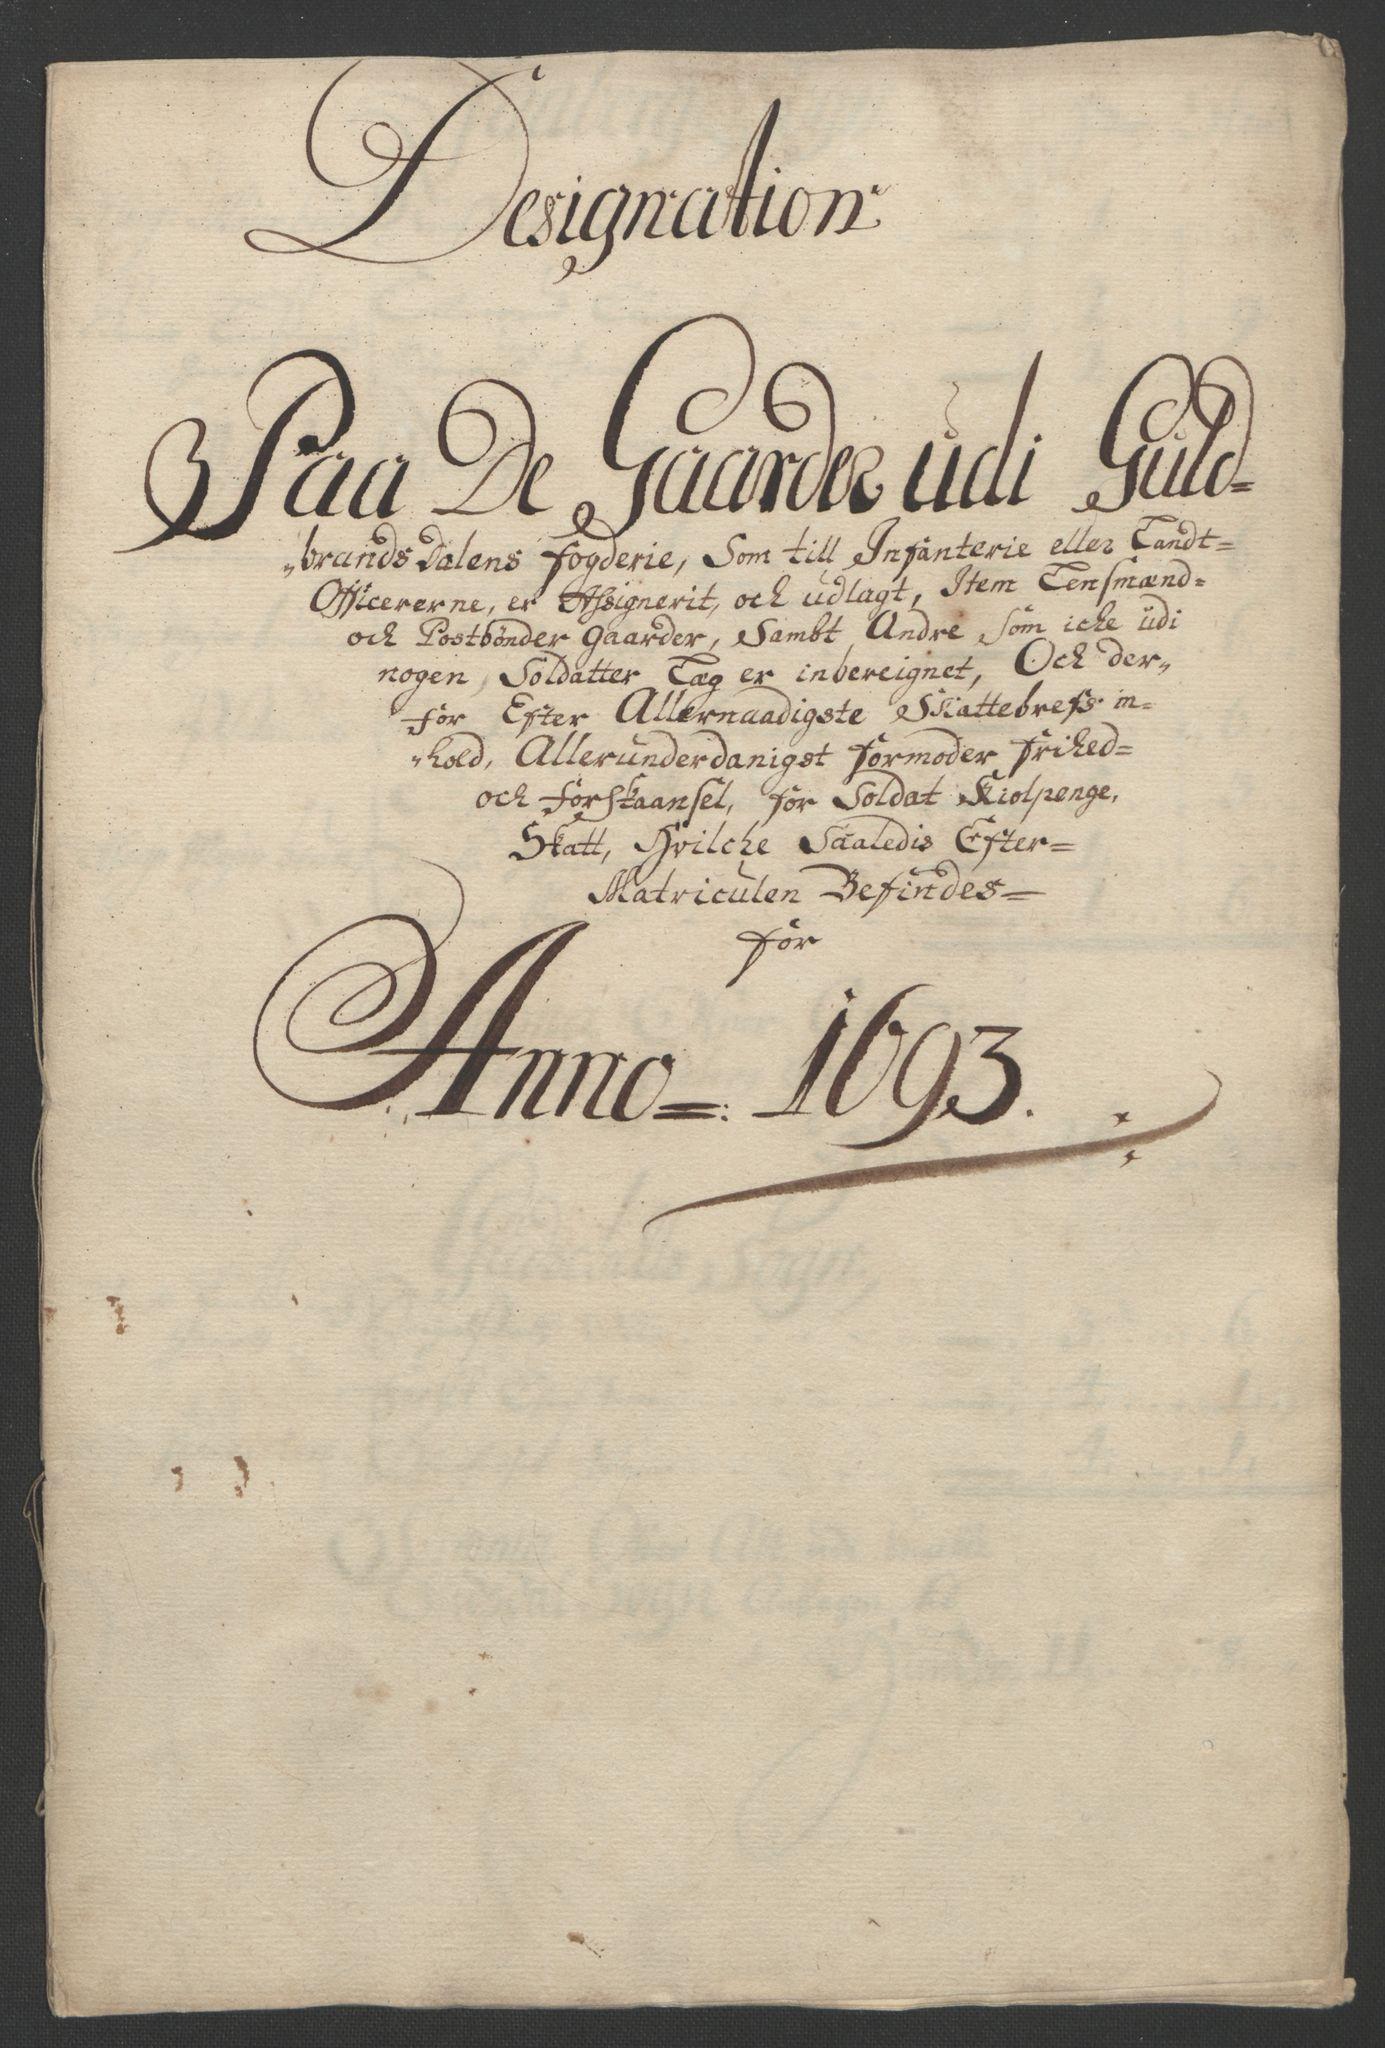 RA, Rentekammeret inntil 1814, Reviderte regnskaper, Fogderegnskap, R17/L1167: Fogderegnskap Gudbrandsdal, 1693, s. 314